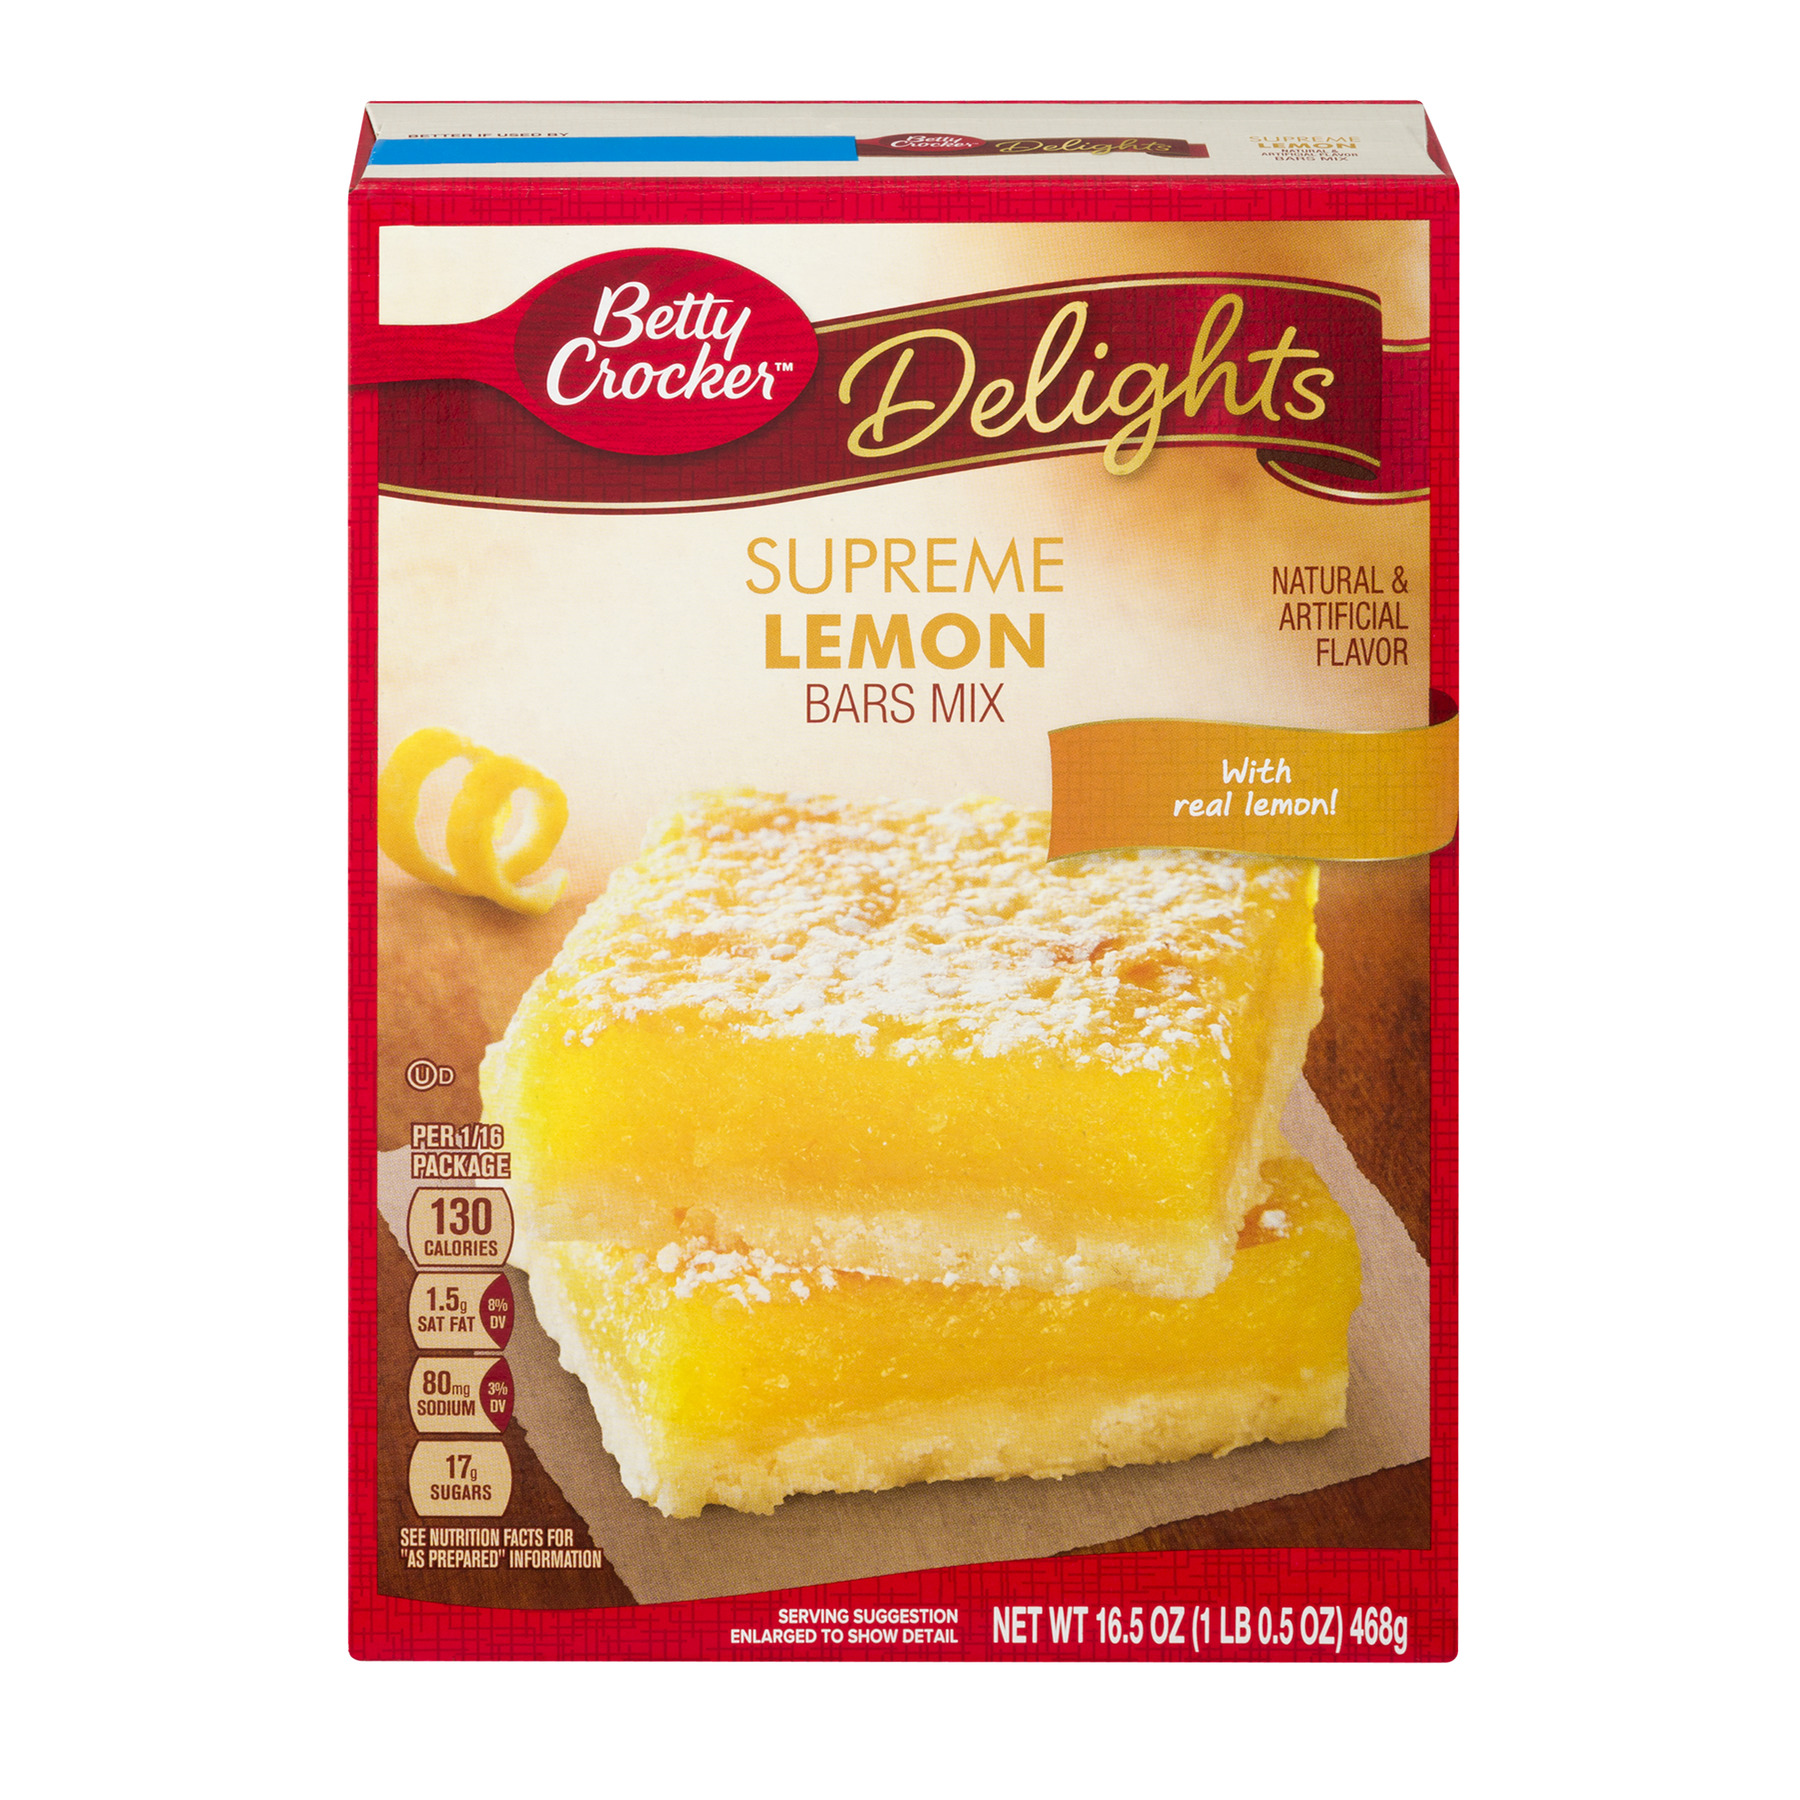 Betty Crocker Delights Dessert Bar Mix Supreme Lemon 16.5 oz Box, 16.5 OZ by General Mills, Inc.